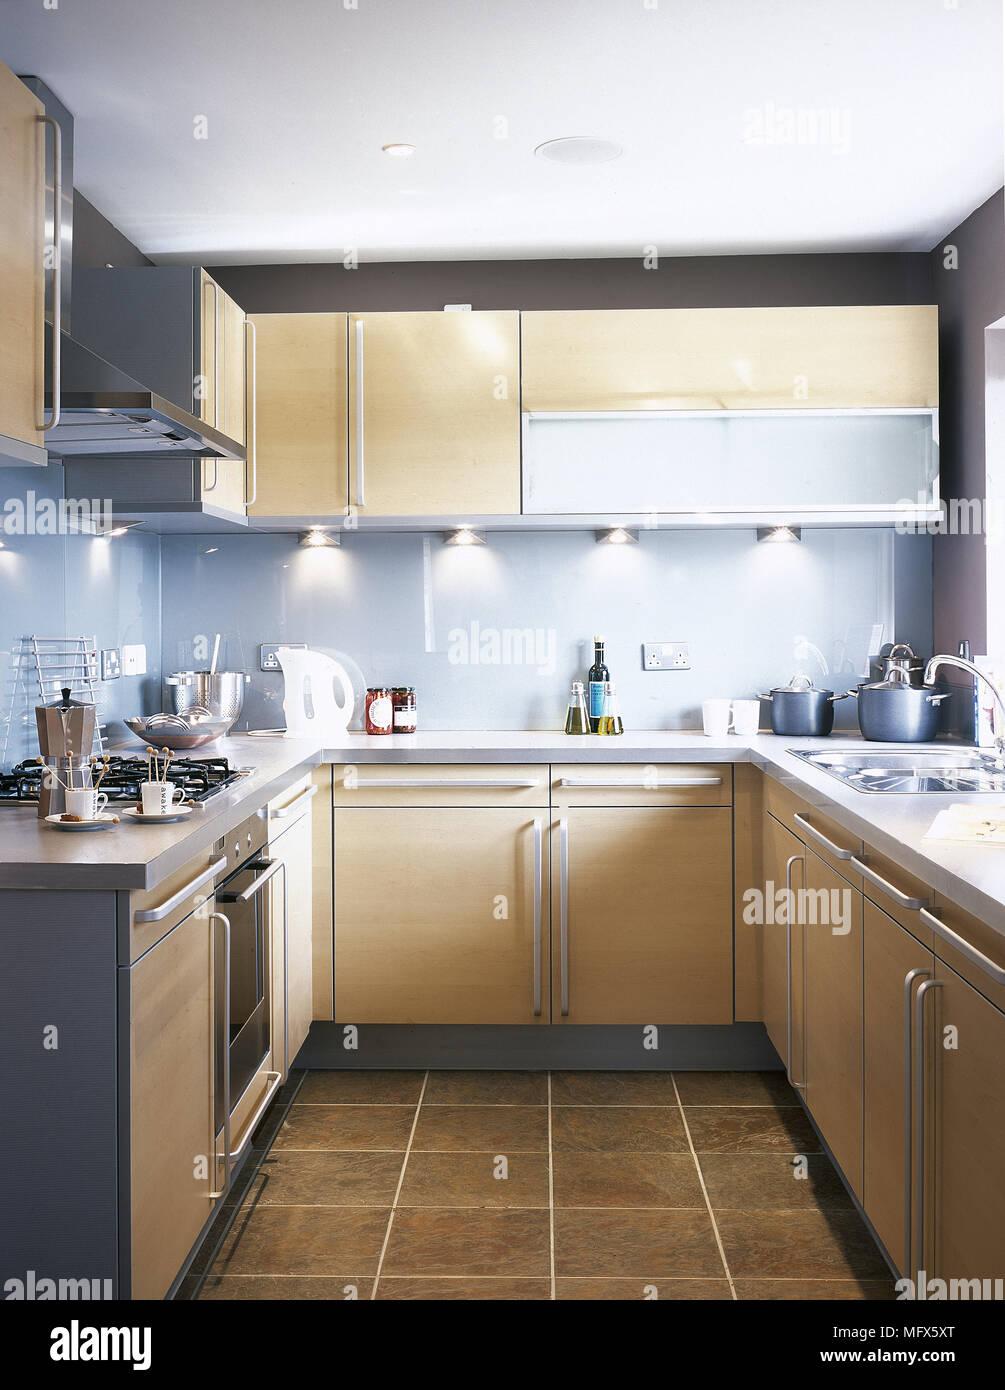 Niedlich Pantry Küche Beleuchtung Layout Ideen - Küchenschrank Ideen ...